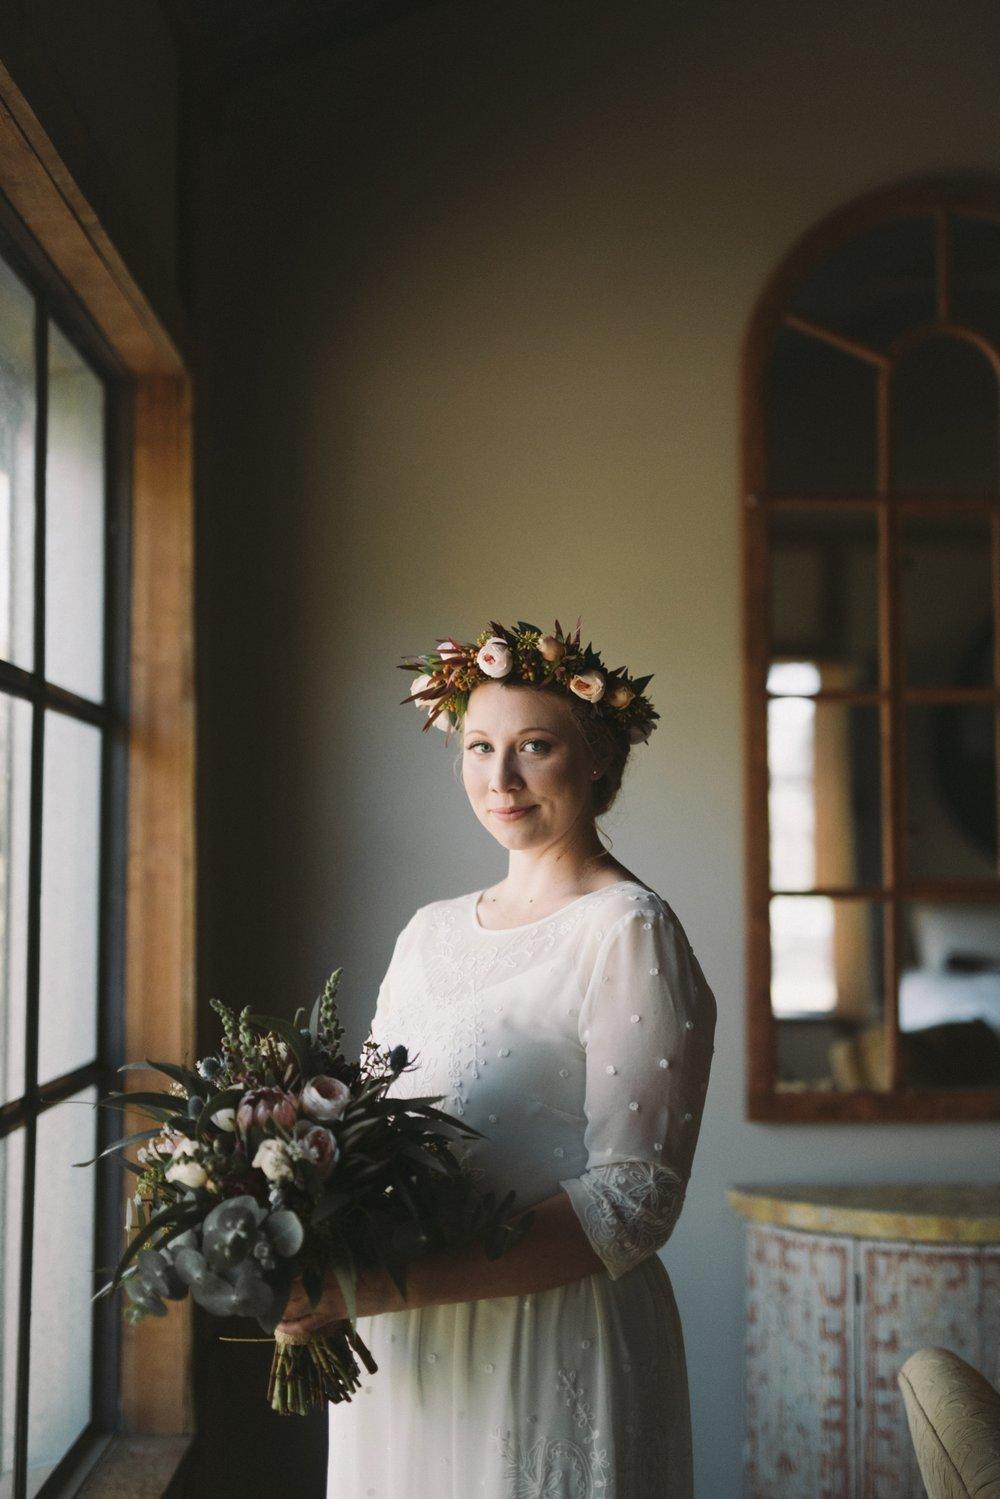 Jo & Aaron - Natural Wedding Photography in Adelaide - Beautiful, modern wedding photographer - Al Ru Farm Wedding Photography - Katherine Schultz_0007.jpg